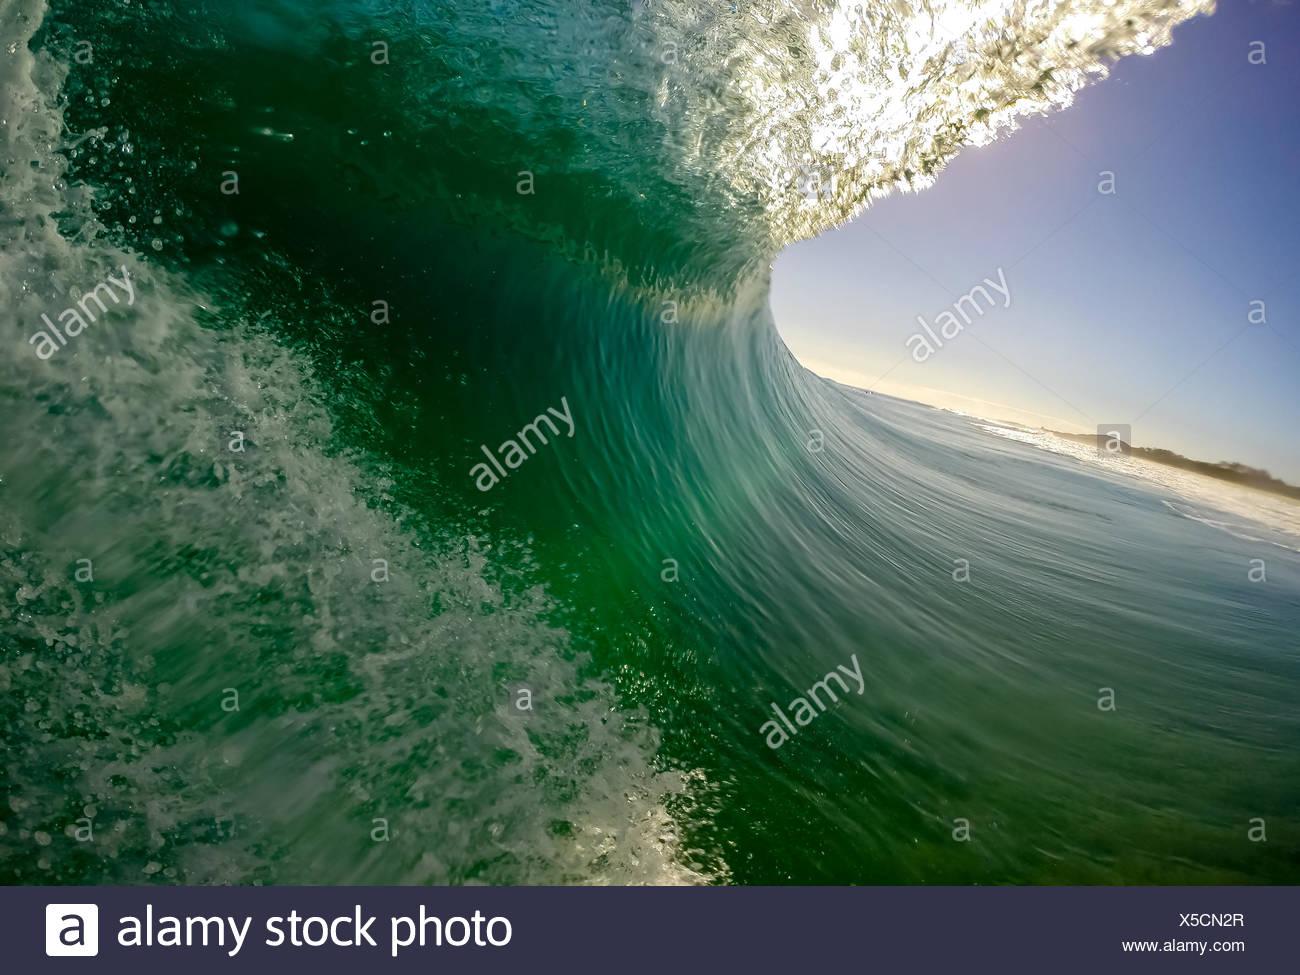 Australia, New South Wales, Wave on Black Rocks Beach - Stock Image